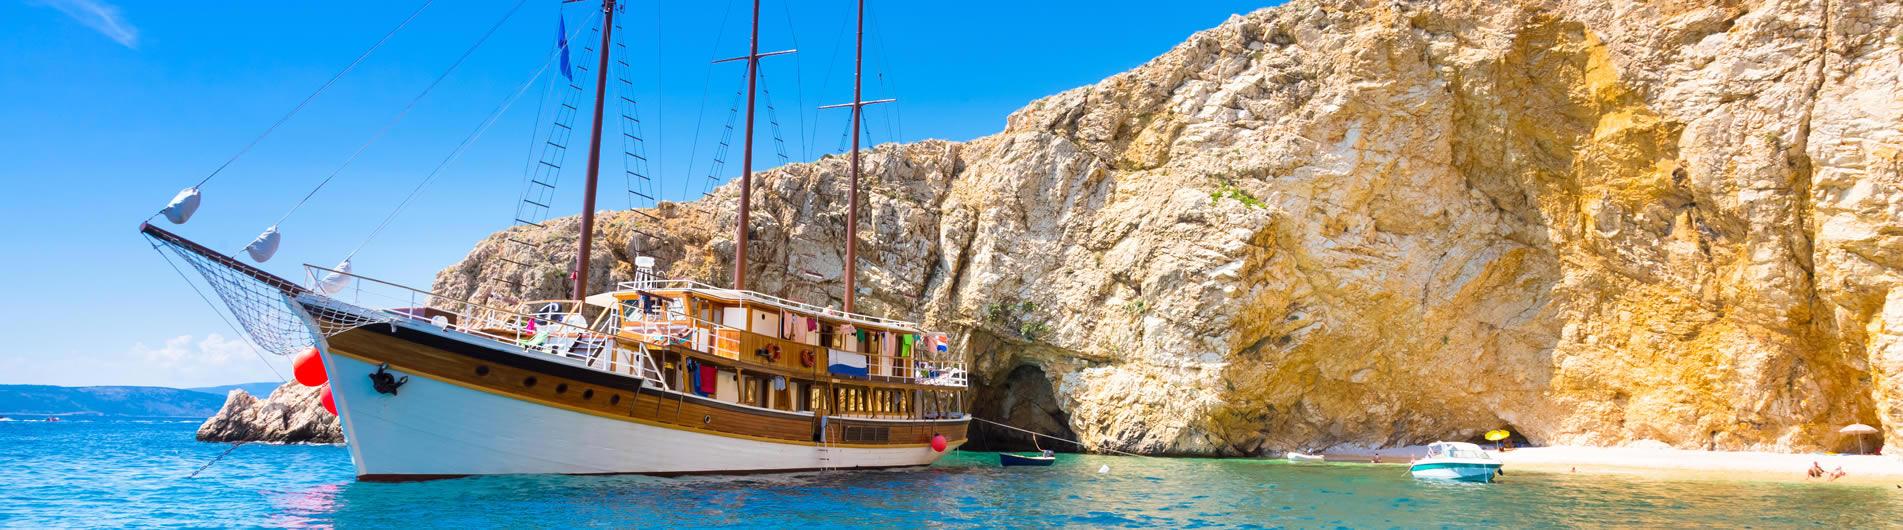 Croatia Holidays with Cyplon Holidays